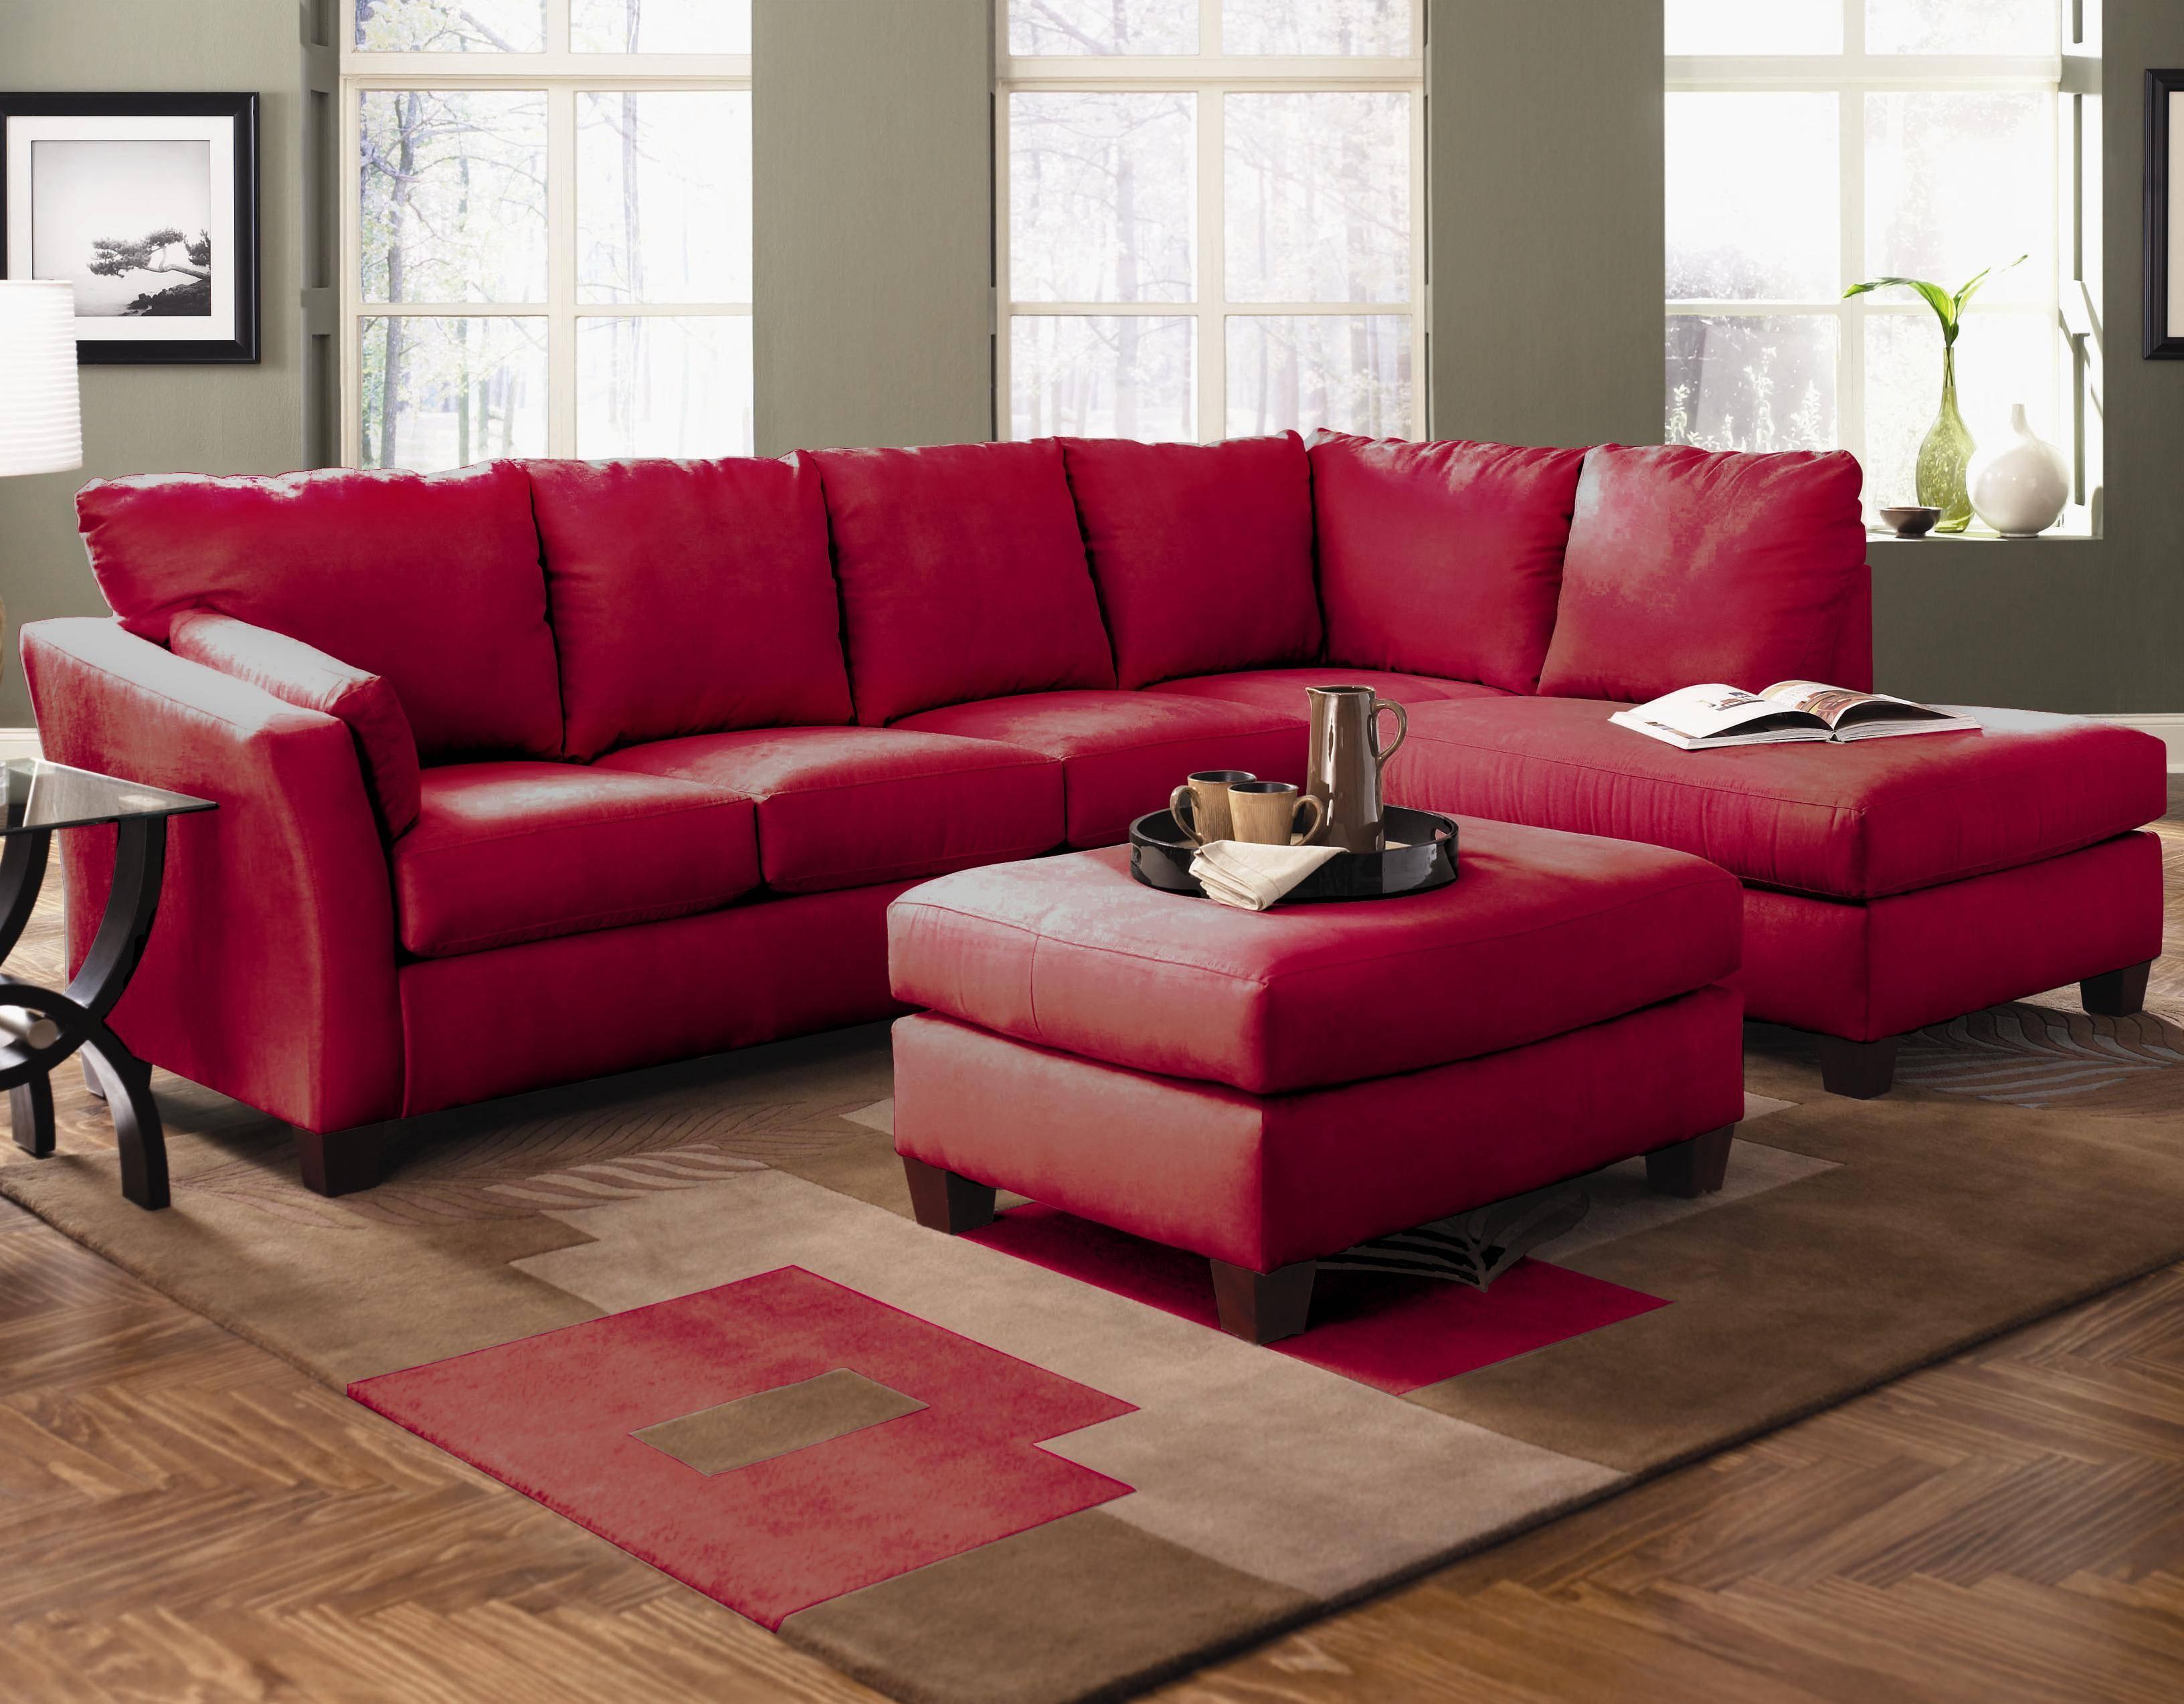 Furniture: Sleeper Sofa Sectional | Sofa Sectional | Broyhill within Broyhill Sectional Sleeper Sofas (Image 11 of 15)